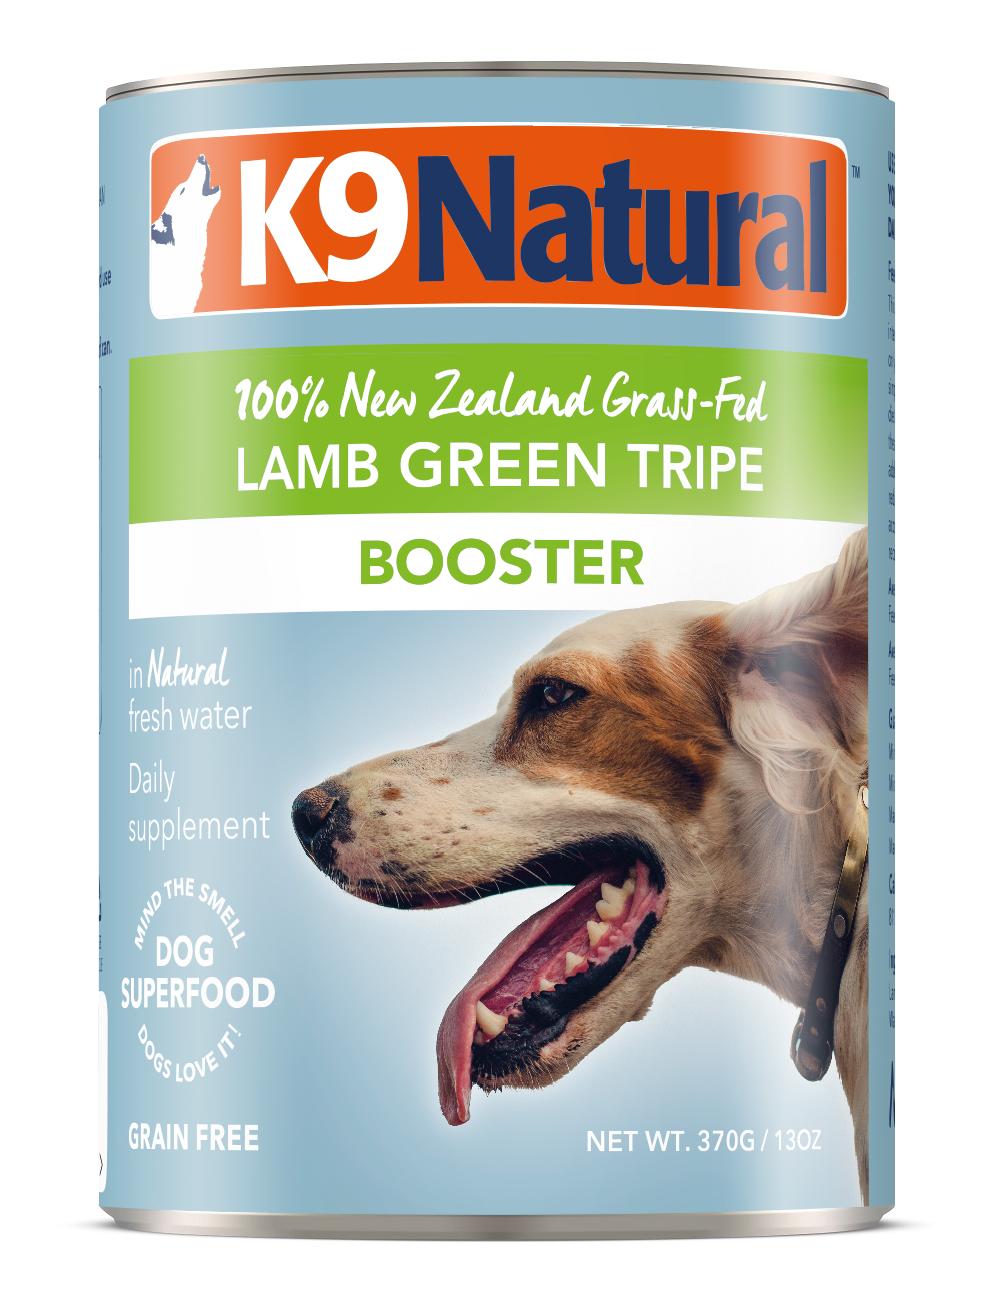 K9 Natural K9 Natural Lamb Green Tripe Booster Wet Dog Food 13oz